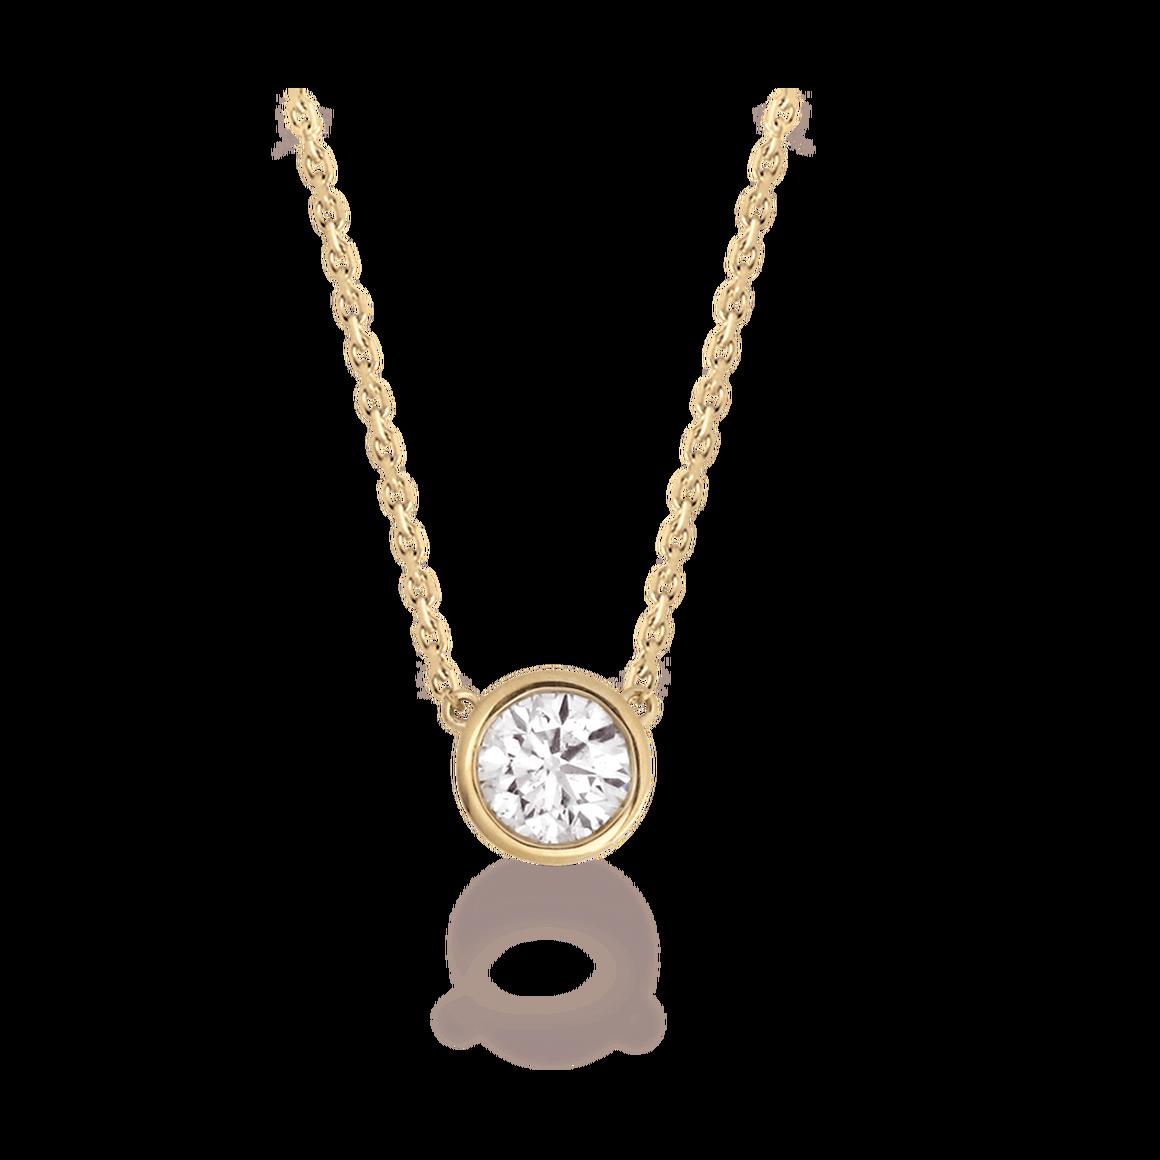 collier femme diamant solitaire